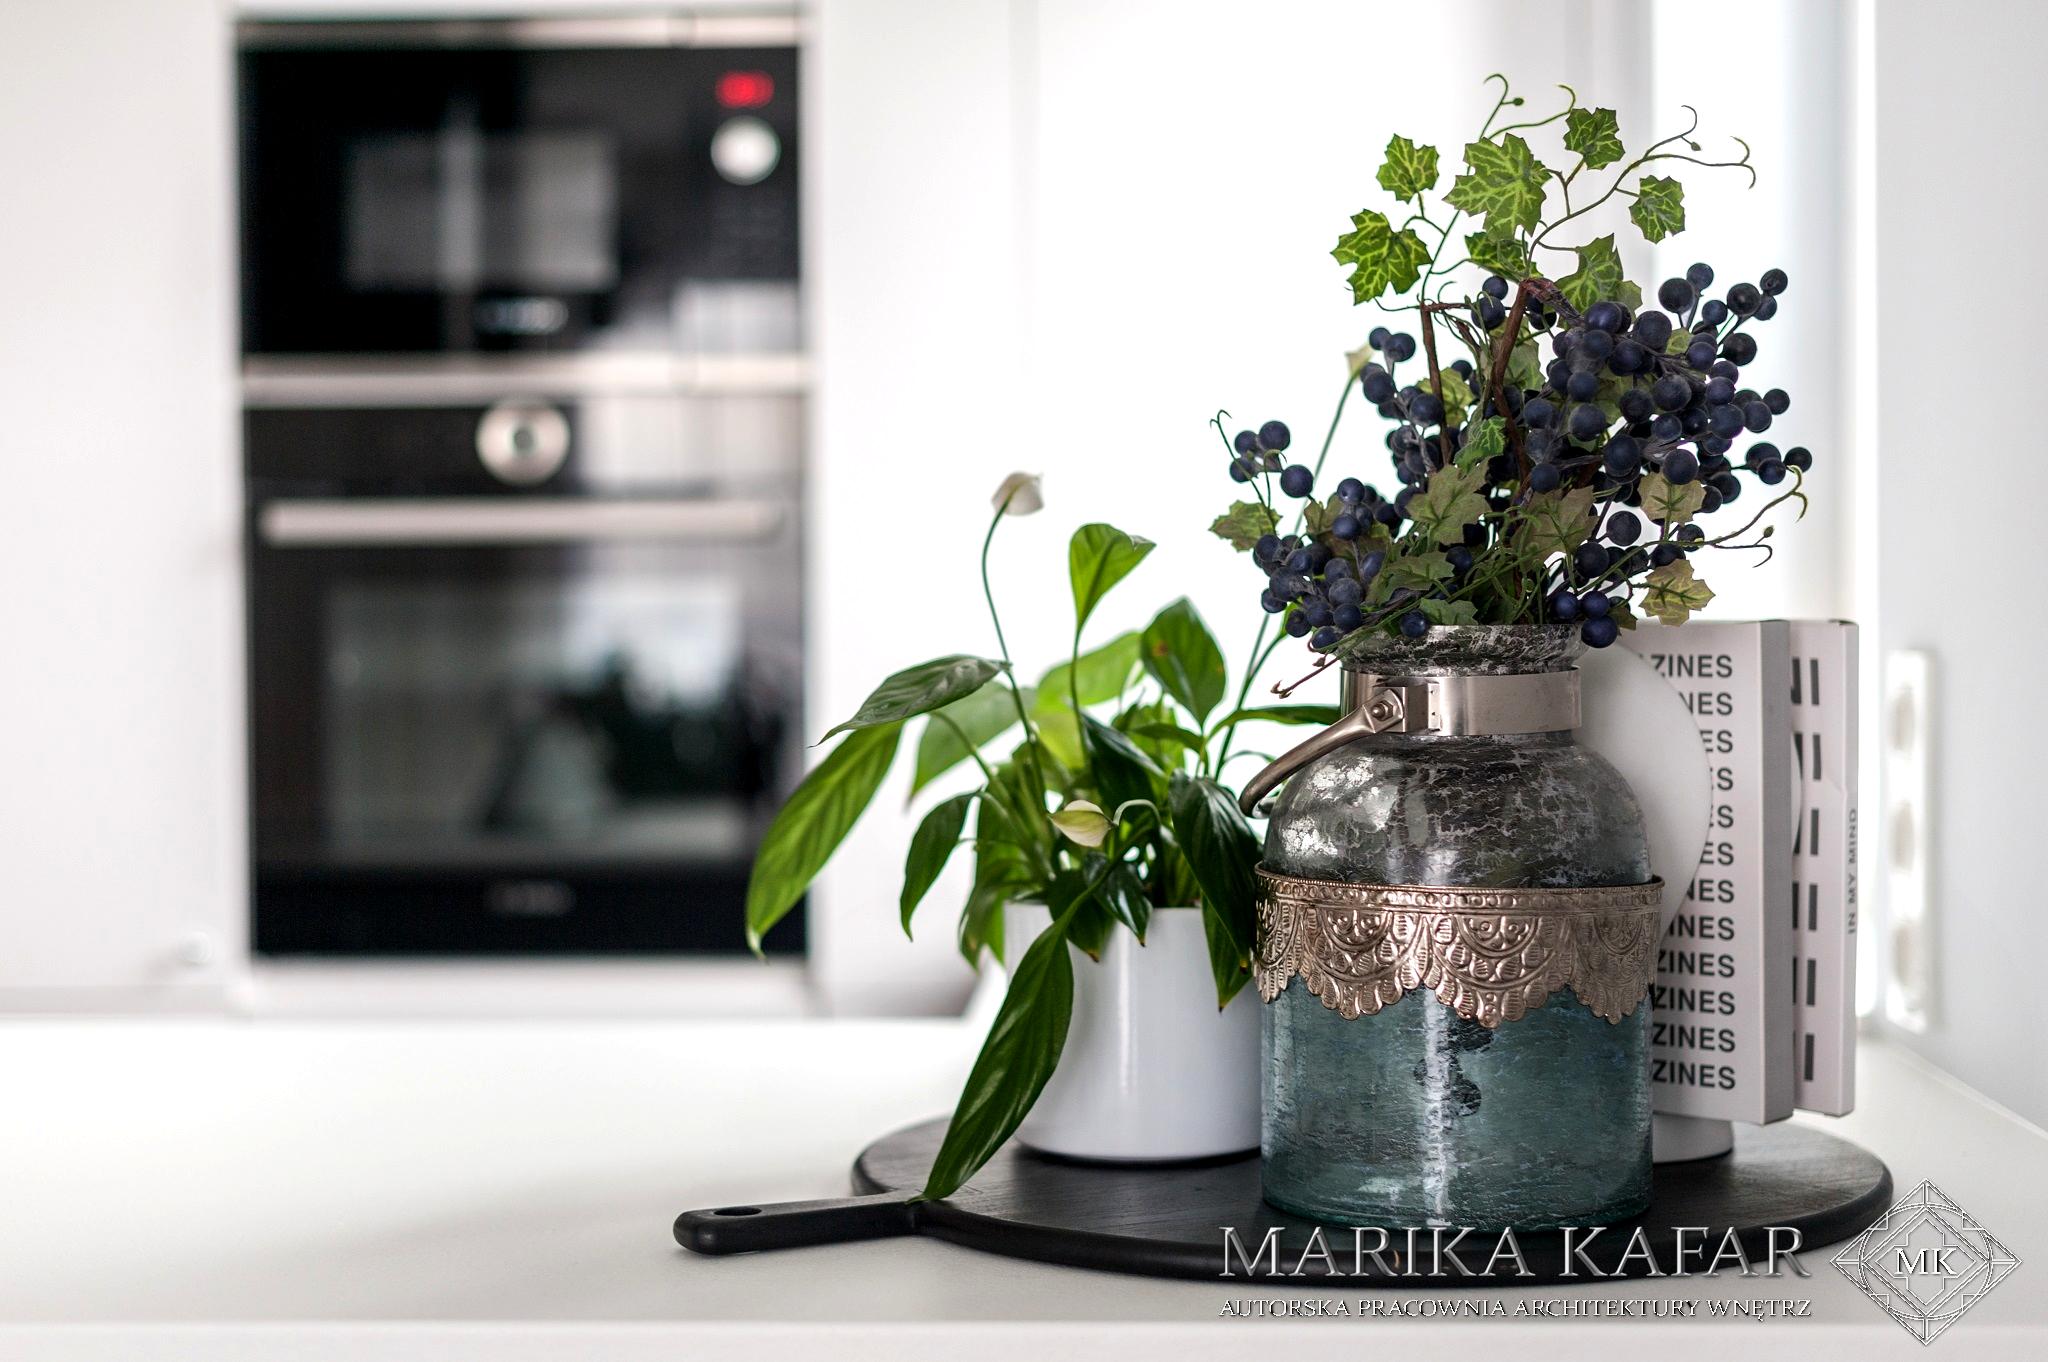 Marika Kafar